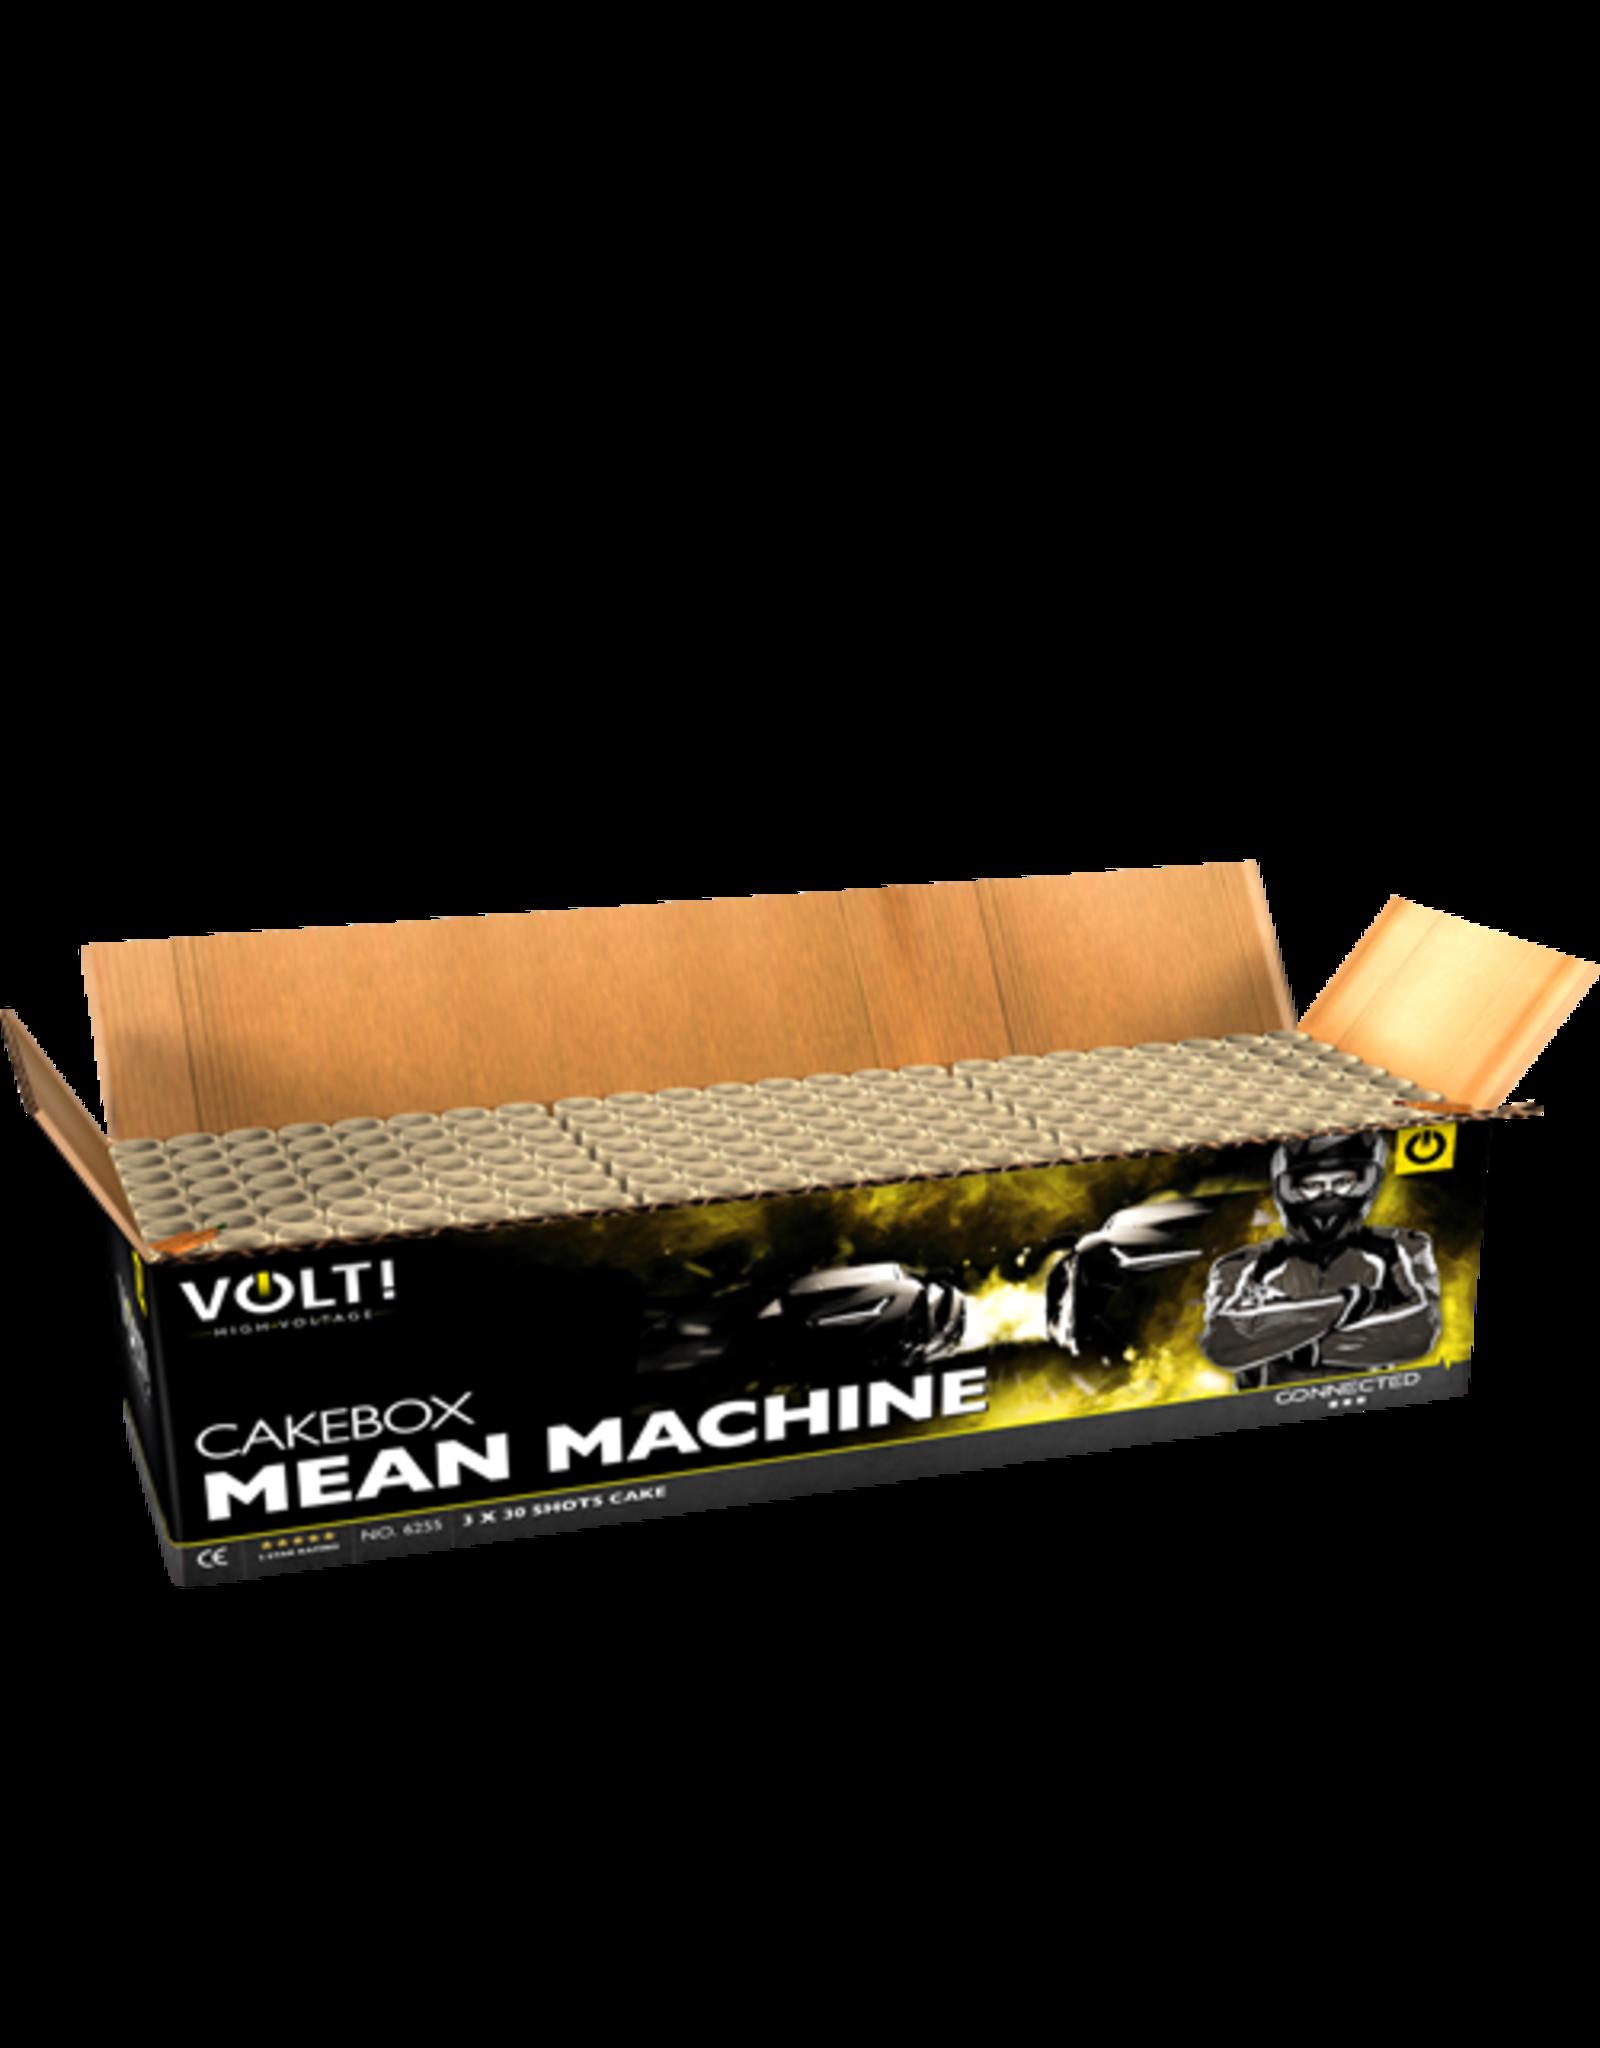 Volt! Mean Machine 90 shots